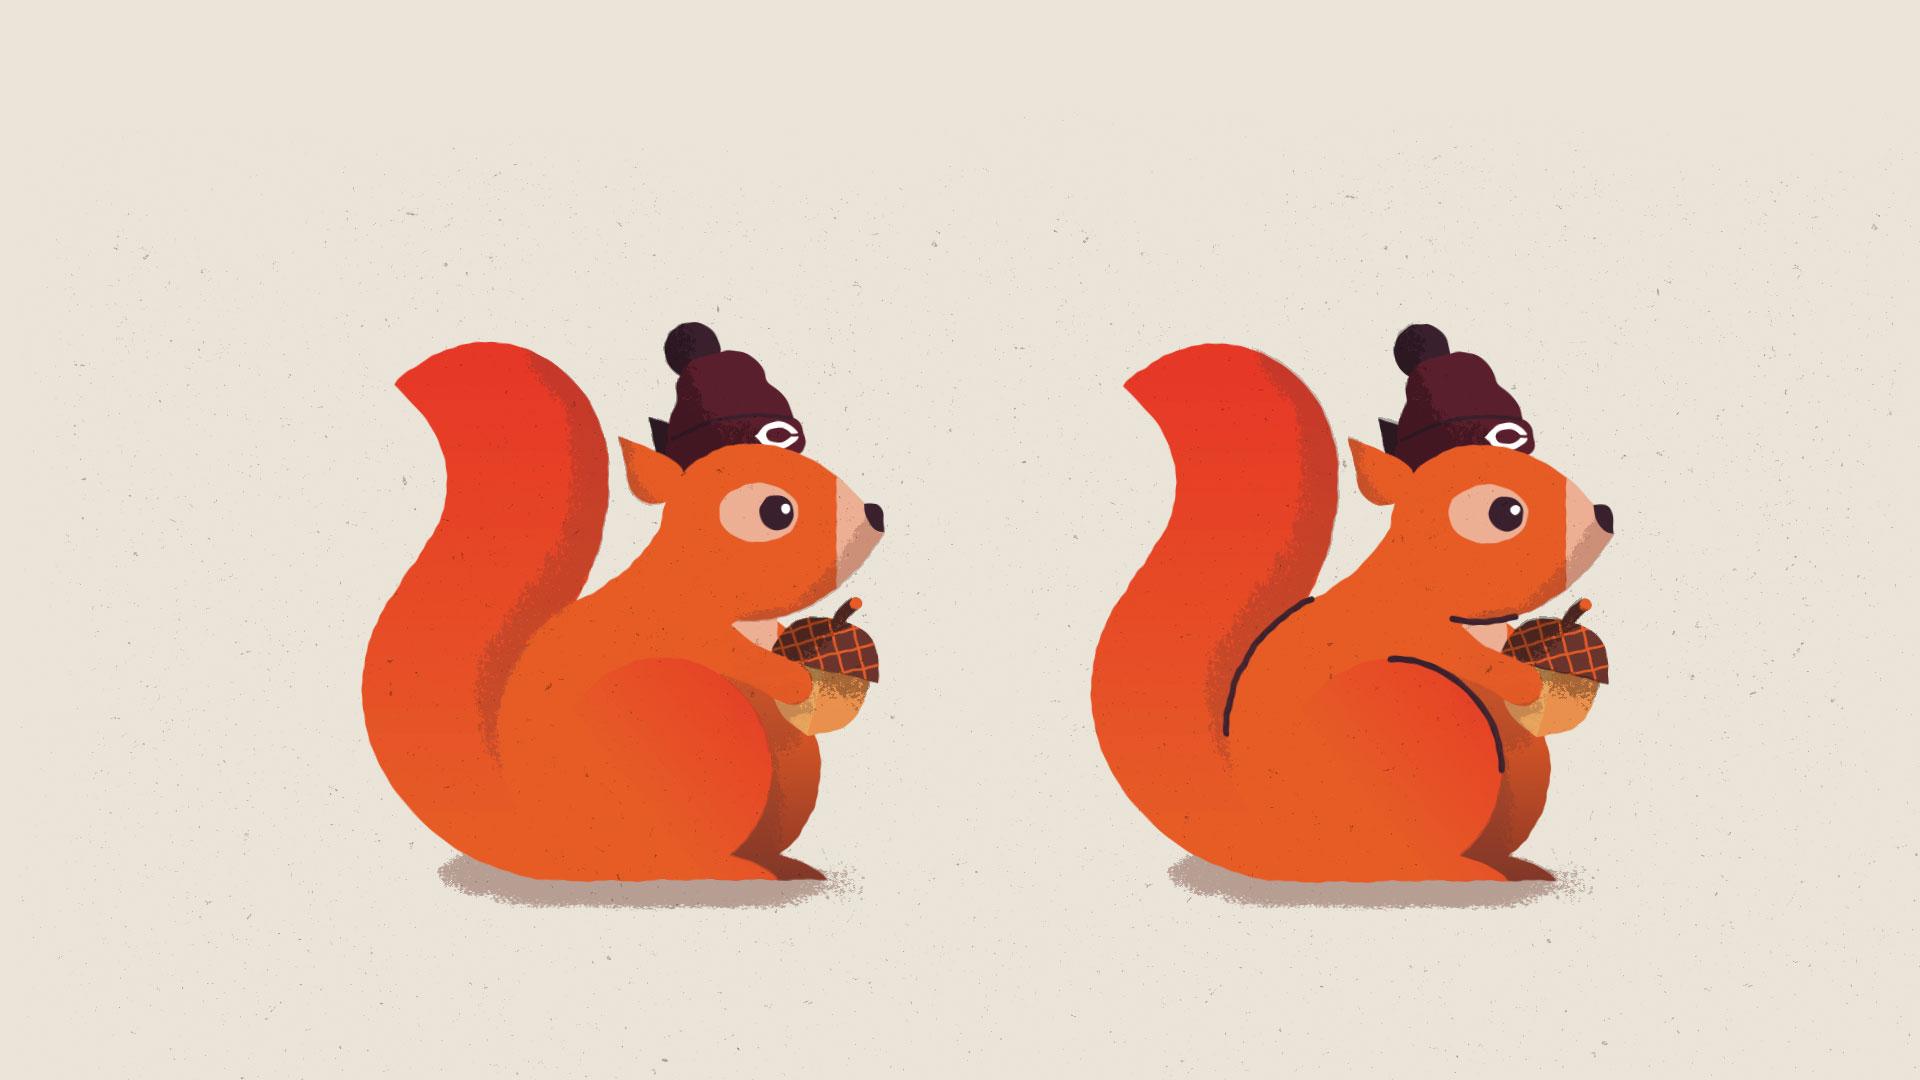 UoC_Squirrel_concept_texturing_v2_120116.jpg